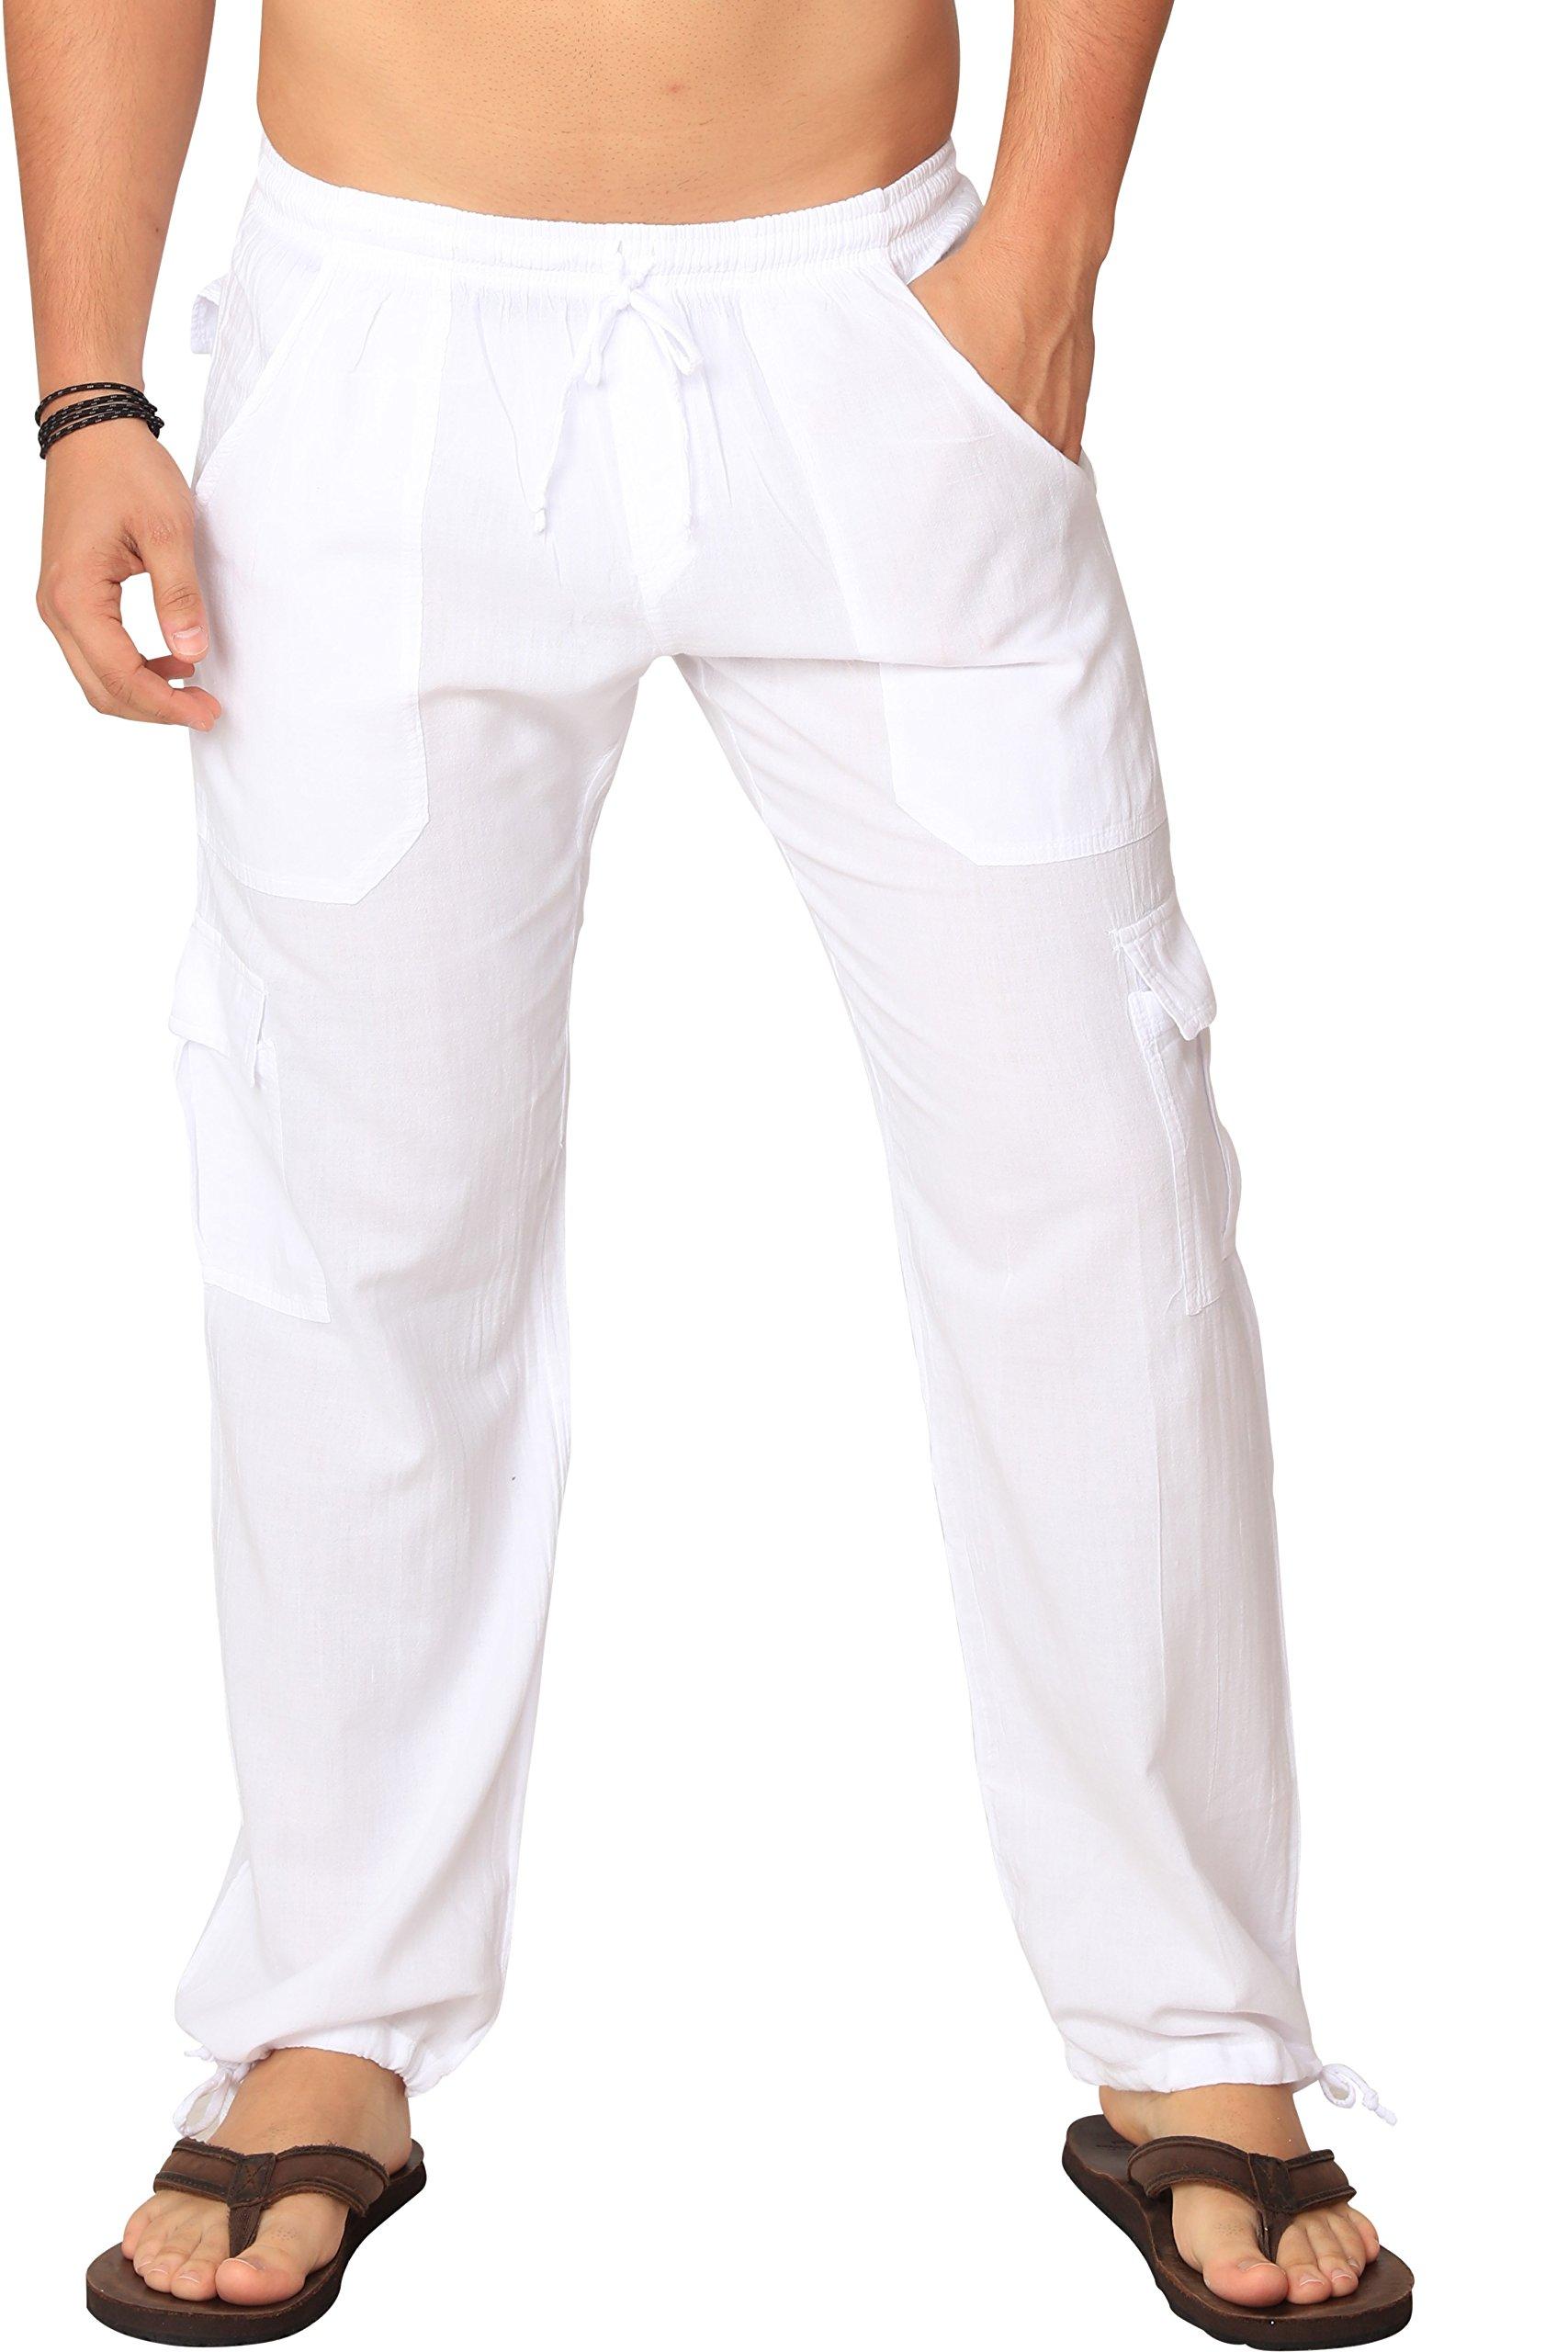 M&B USA Cotton White Cargo Pants Summer Beach Elastic Waistband Casual Pants (X-Large, White)